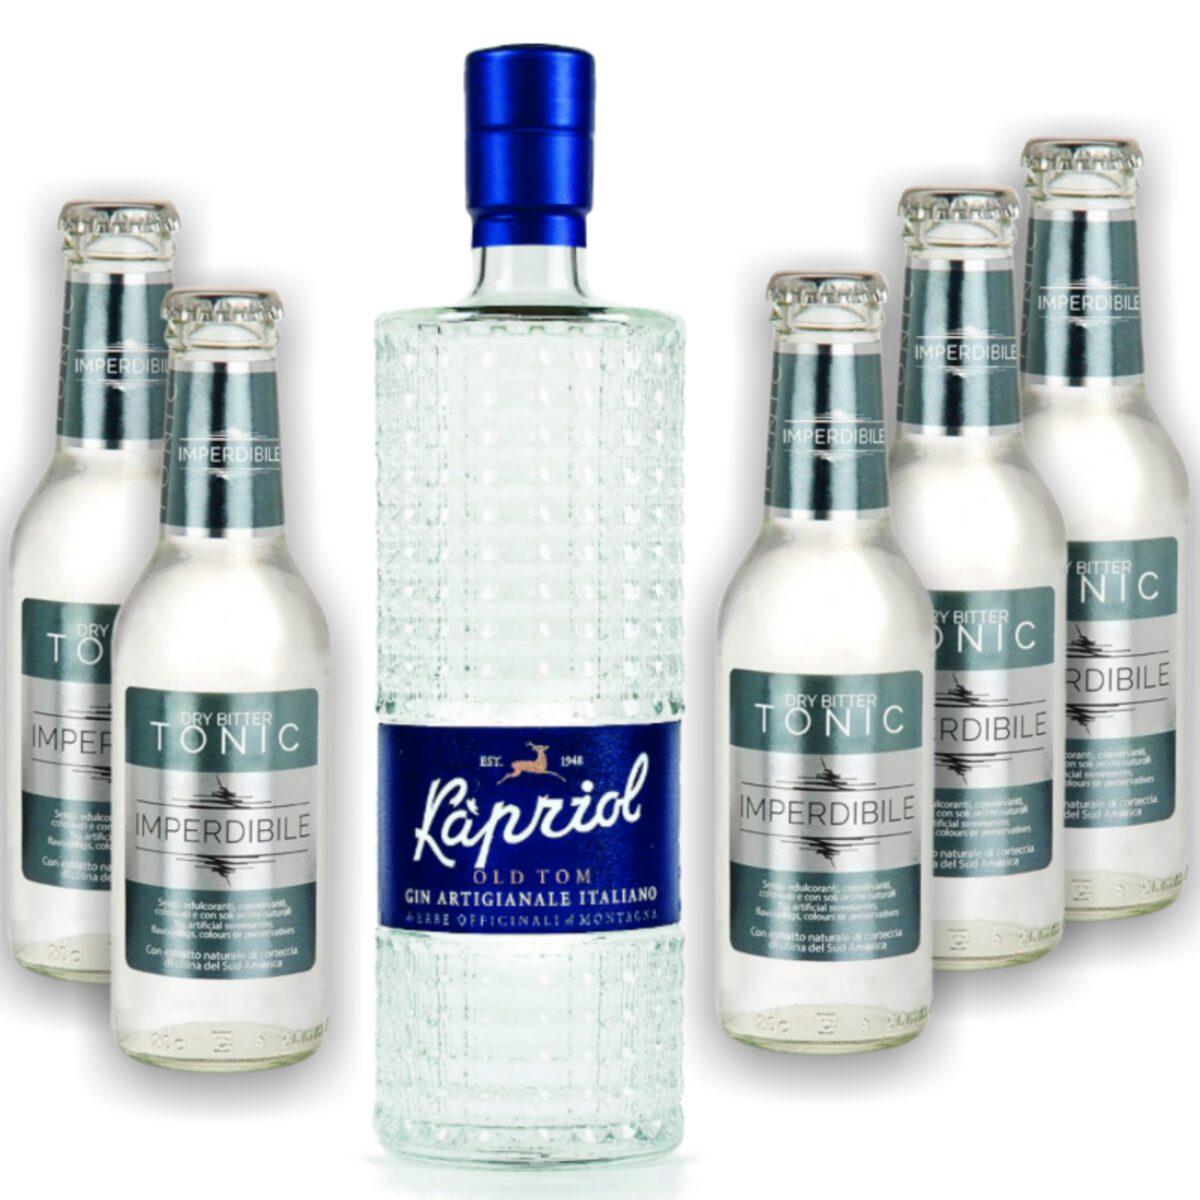 Kapriol Old Tom Gin + Dry Tonic